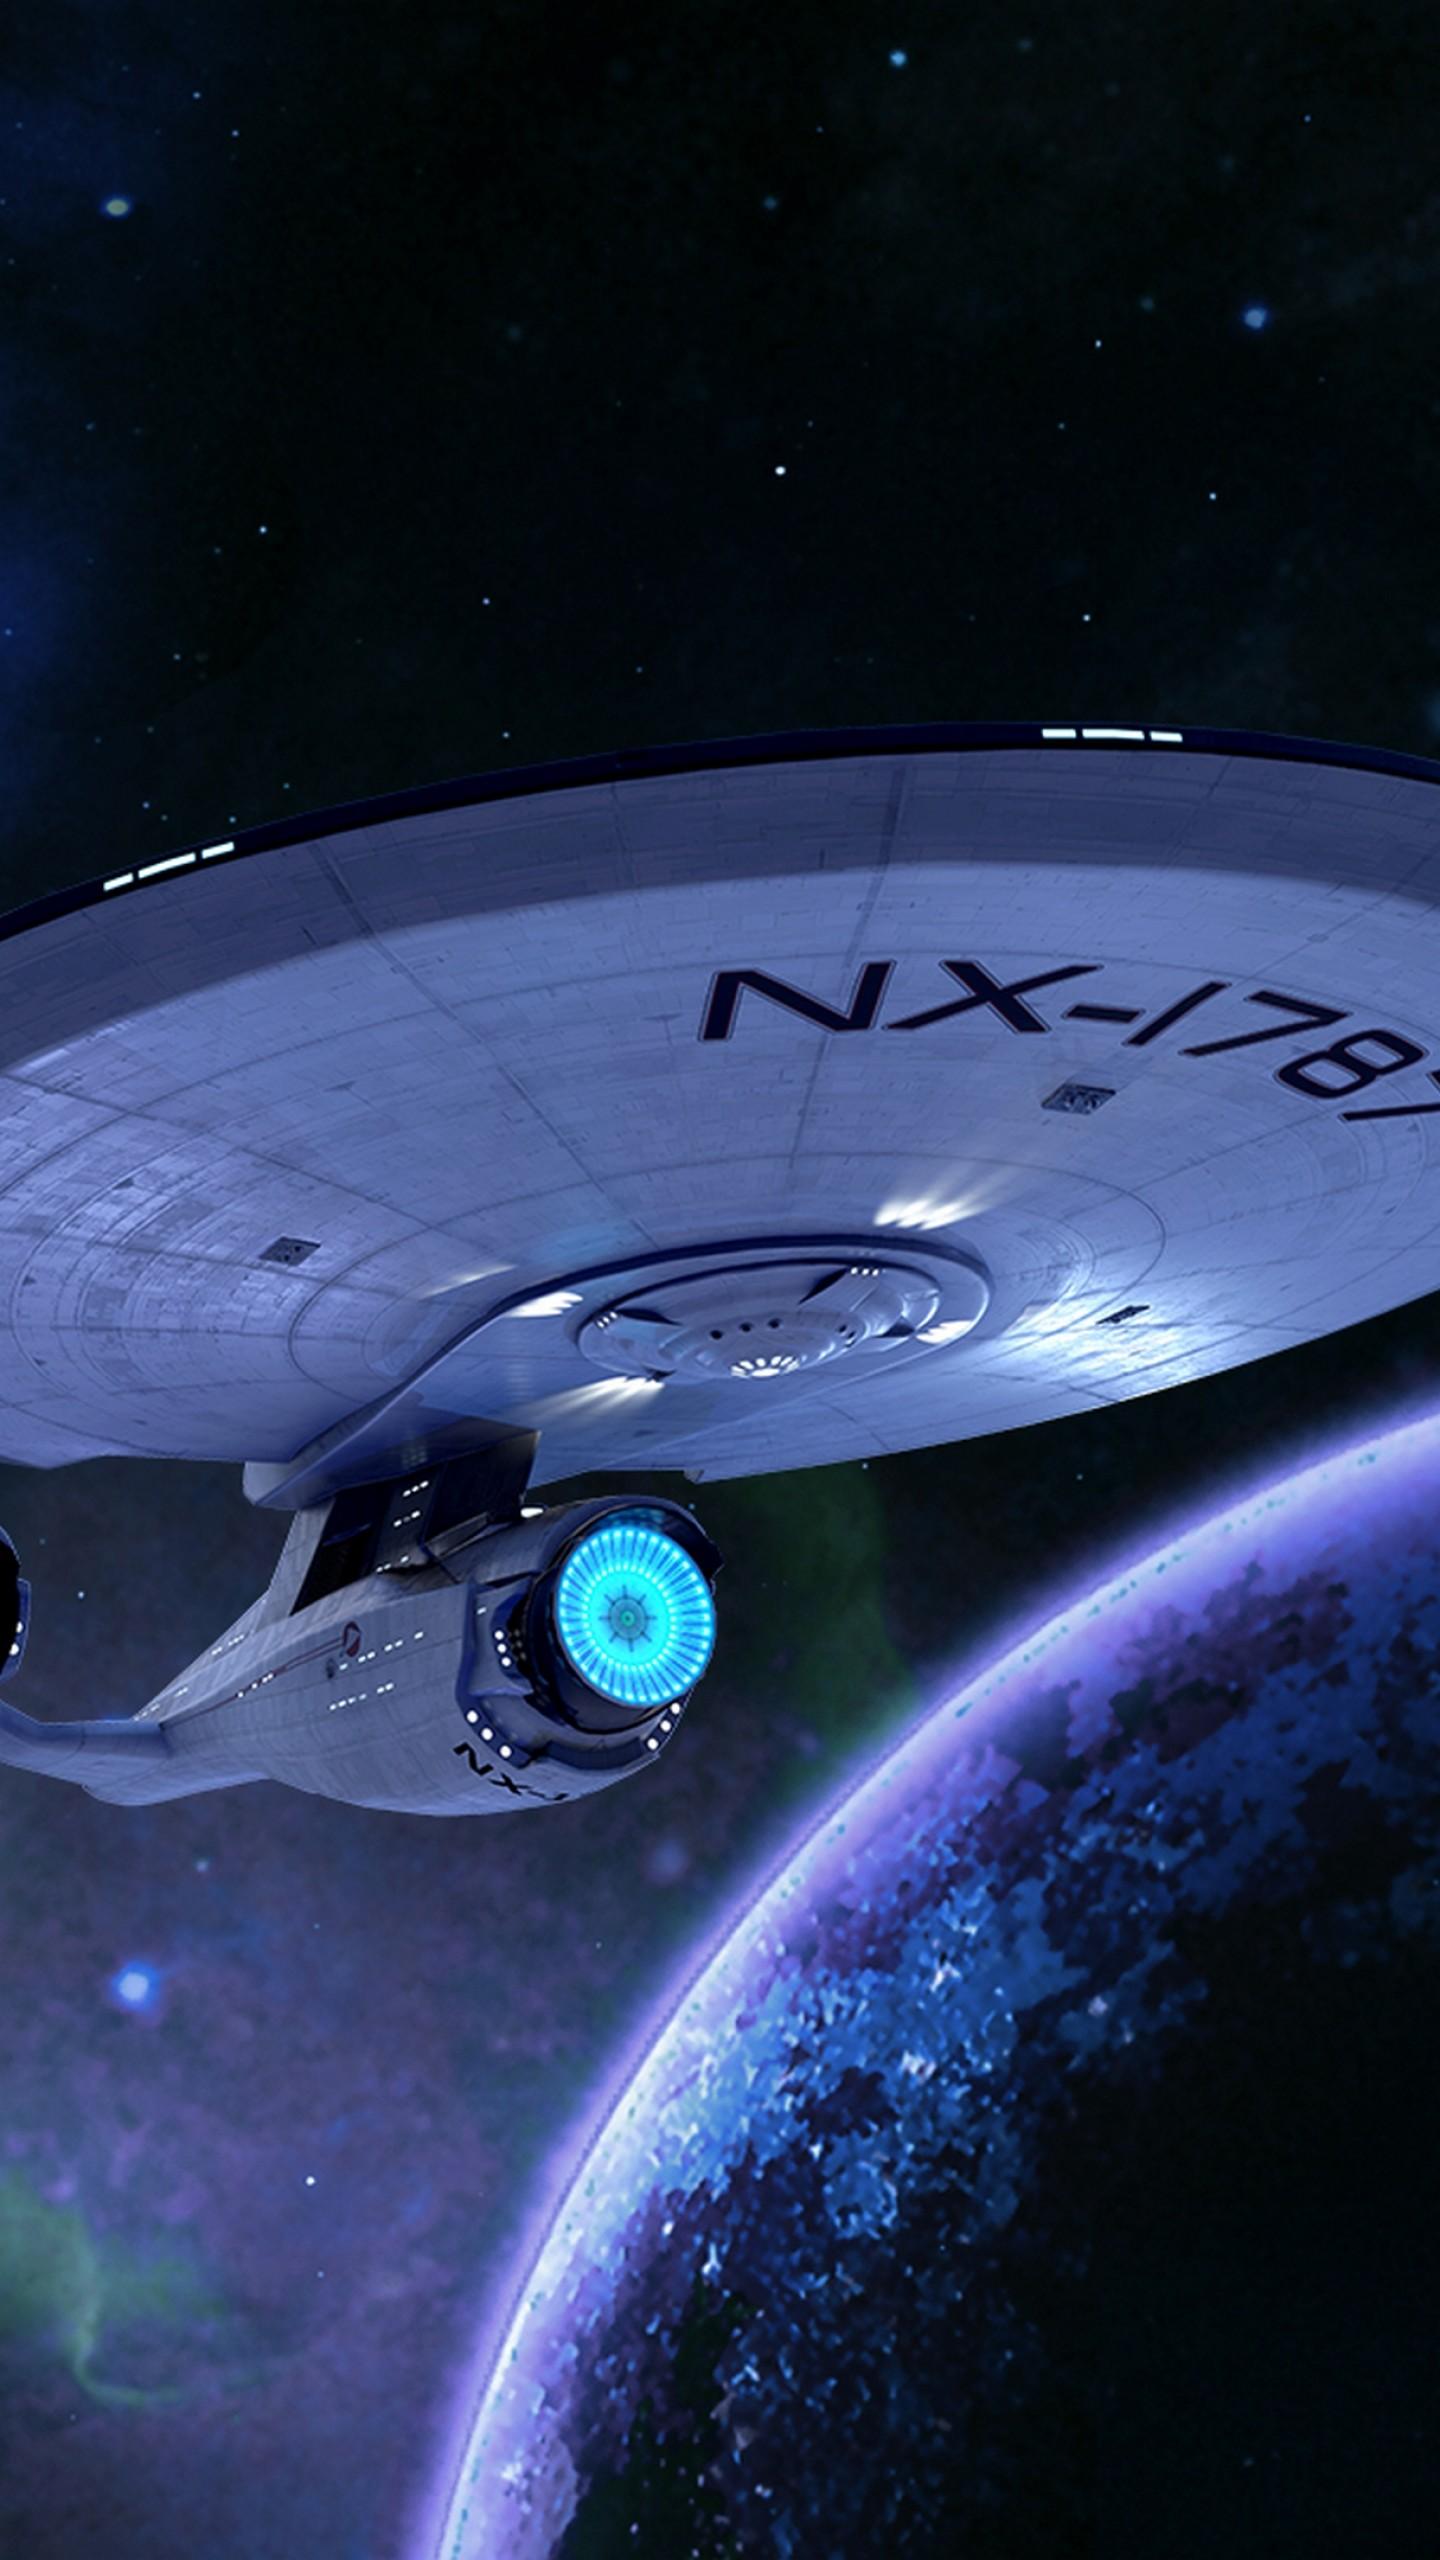 Wallpaper Star Trek Bridge Crew poster VR 4k Games 17842